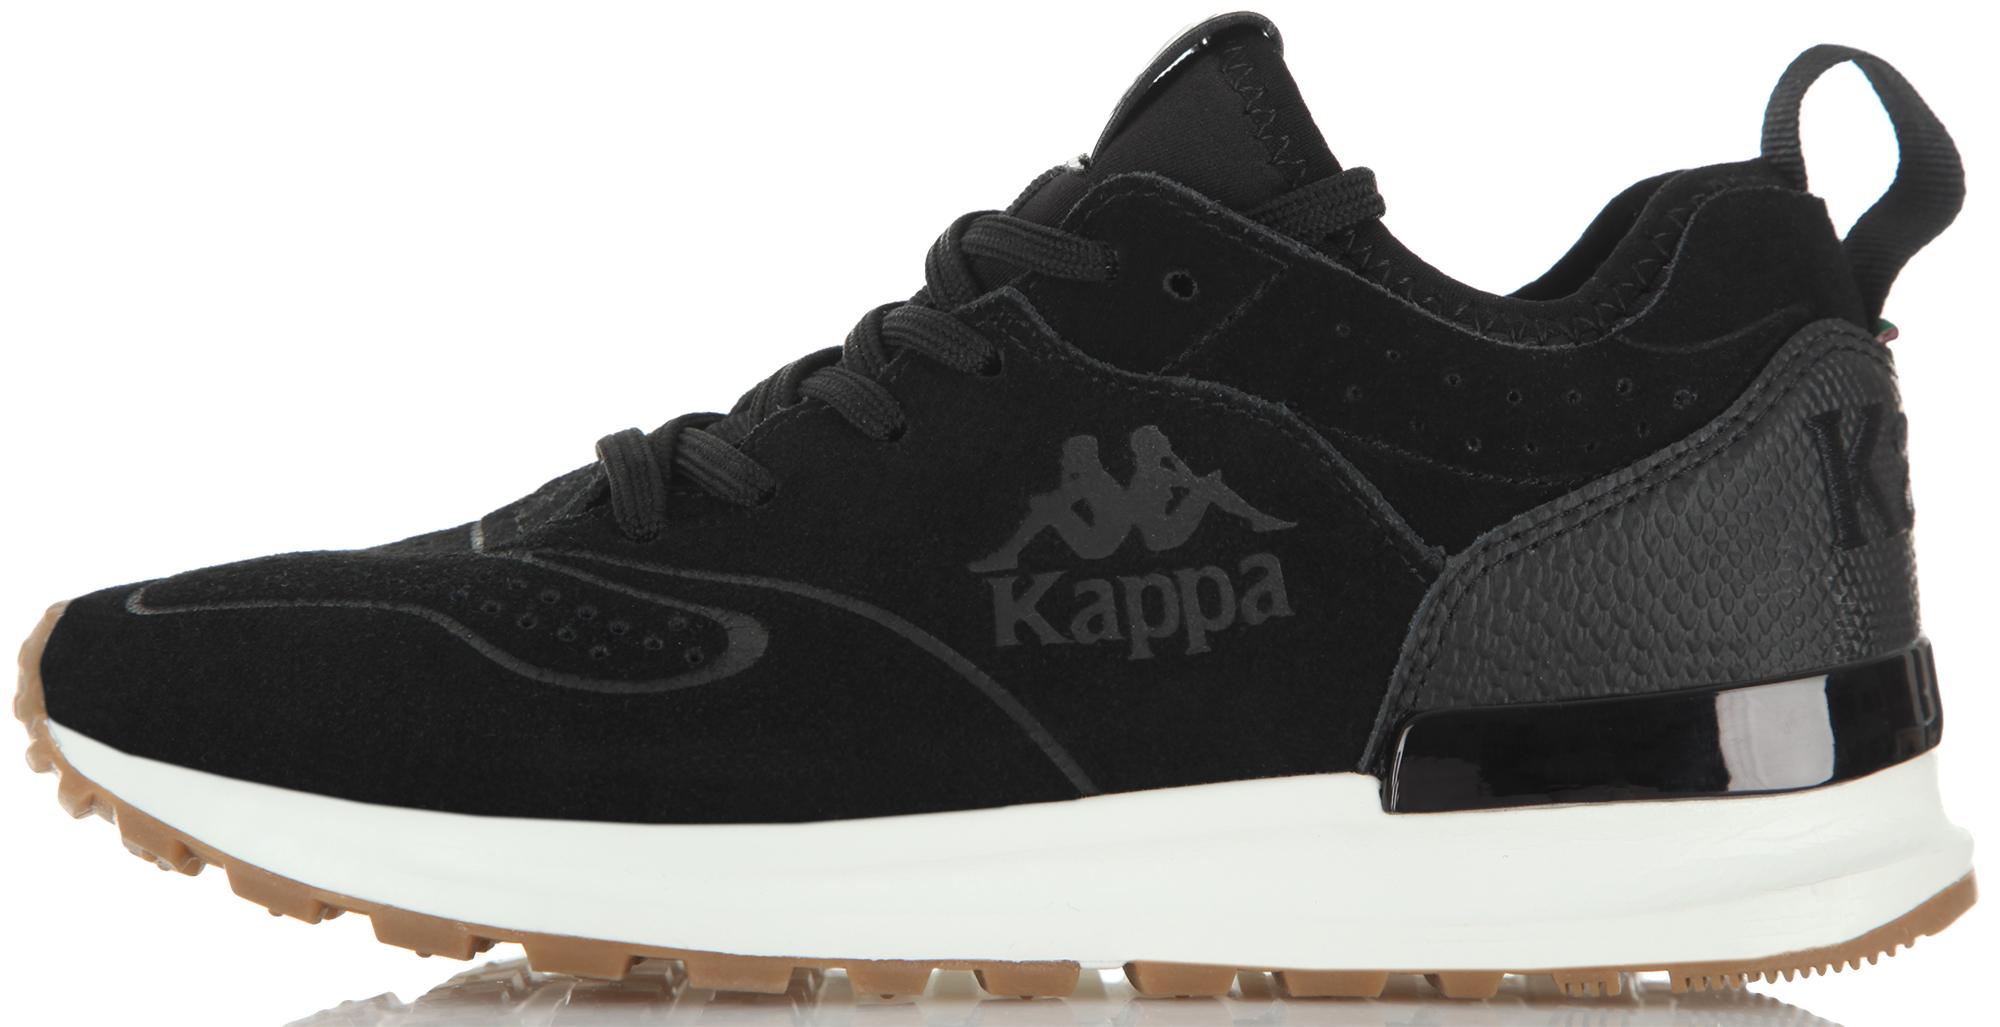 Kappa Кроссовки женские Kappa Neoclassic, размер 41 kappa кроссовки женские kappa linea